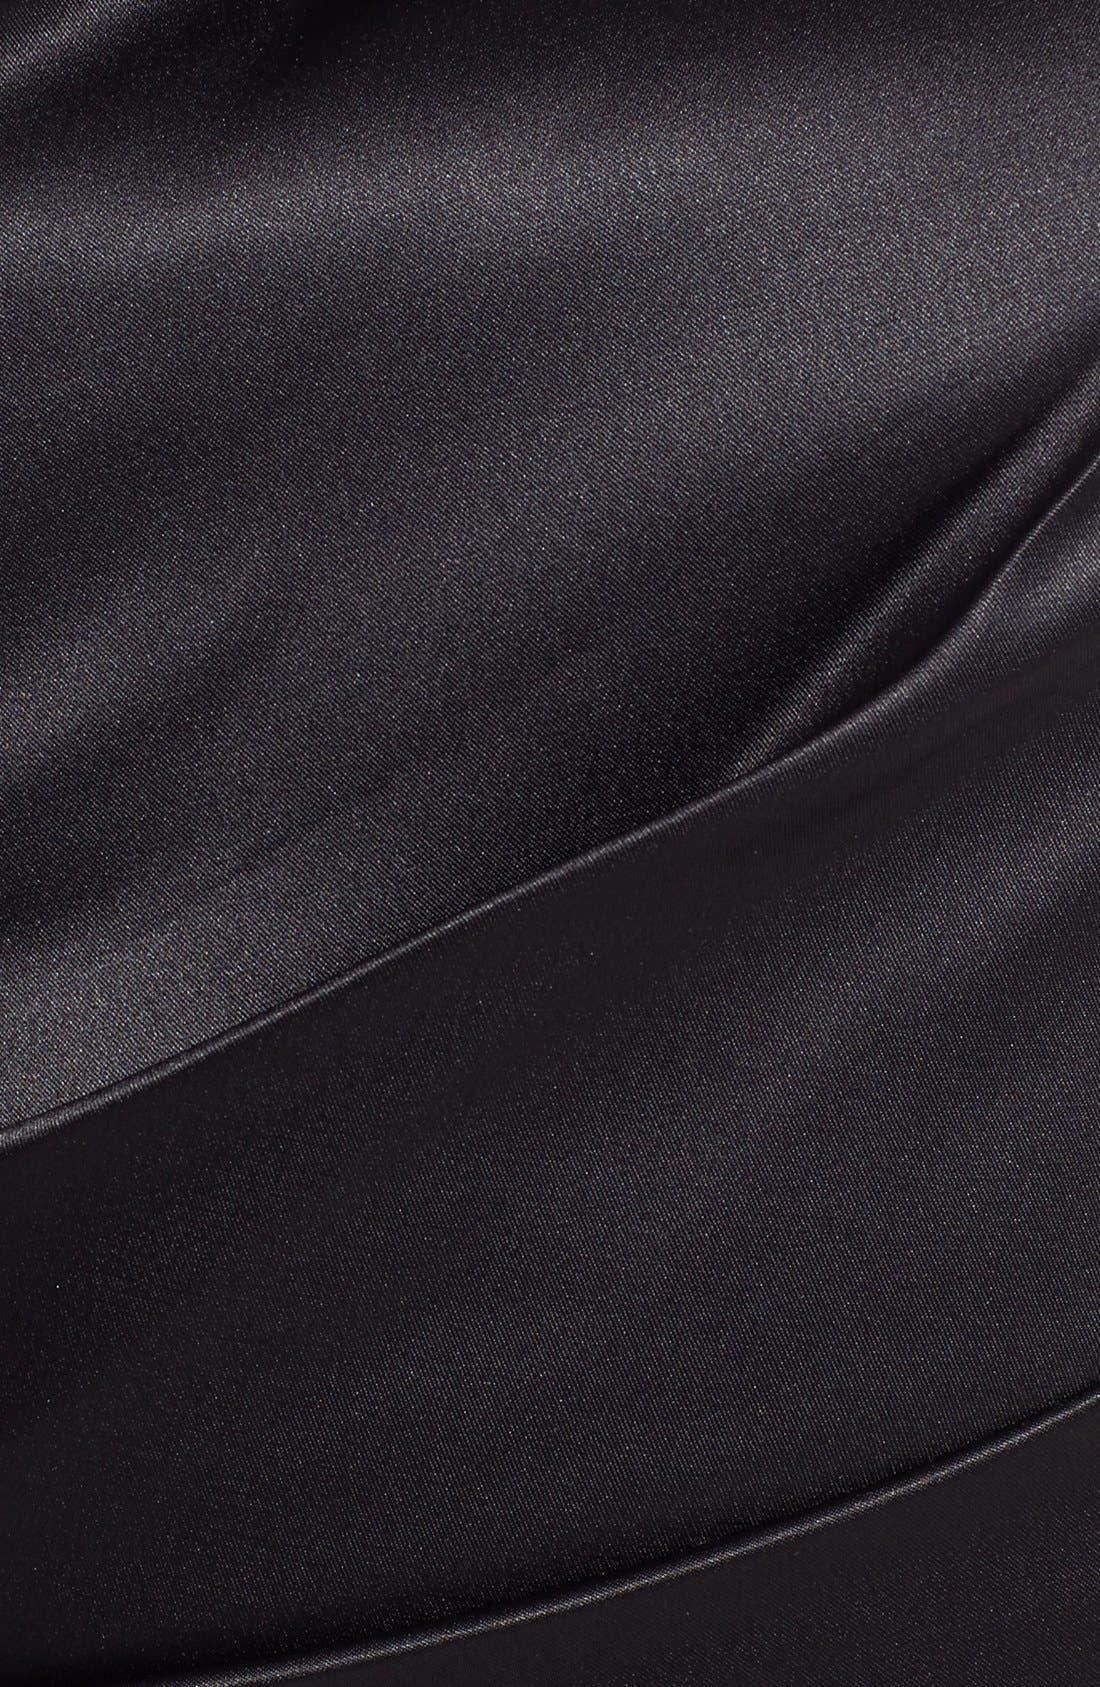 Beaded One-Shoulder Satin Dress,                             Alternate thumbnail 15, color,